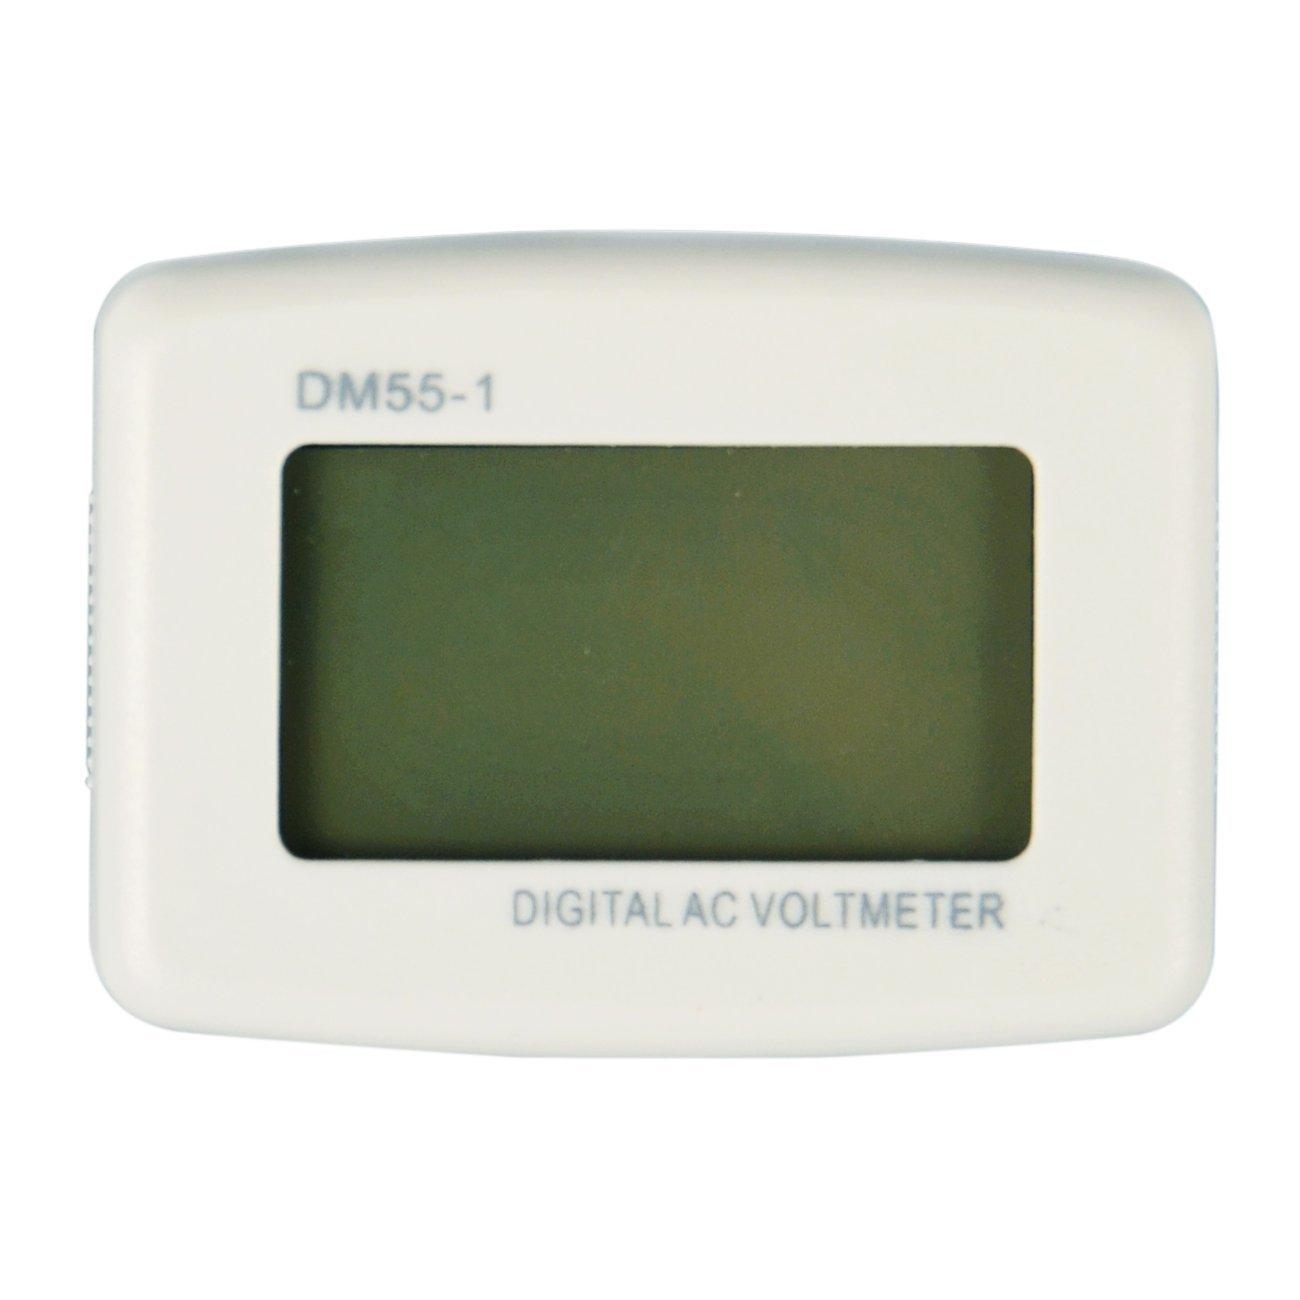 Cheap Plug In Voltage Tester, find Plug In Voltage Tester deals on ...